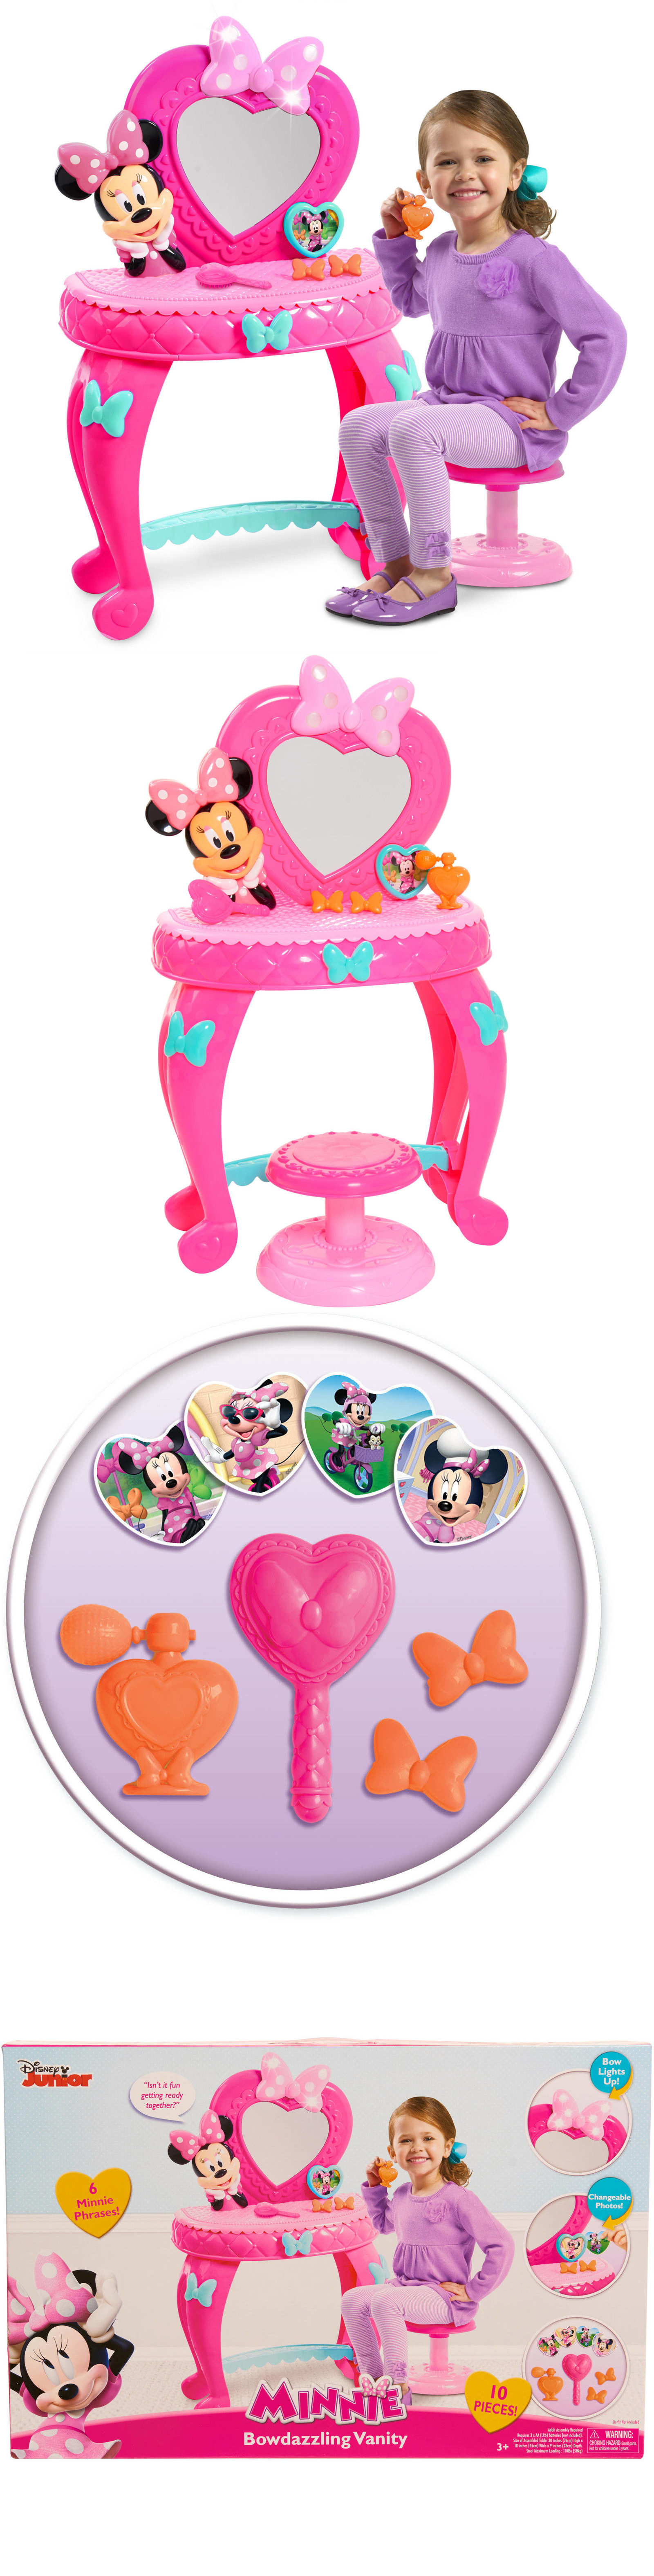 Minnie 19220: Girls Vanity Pink Disney Table Stool, Play Brush, Play  Perfume Bottle